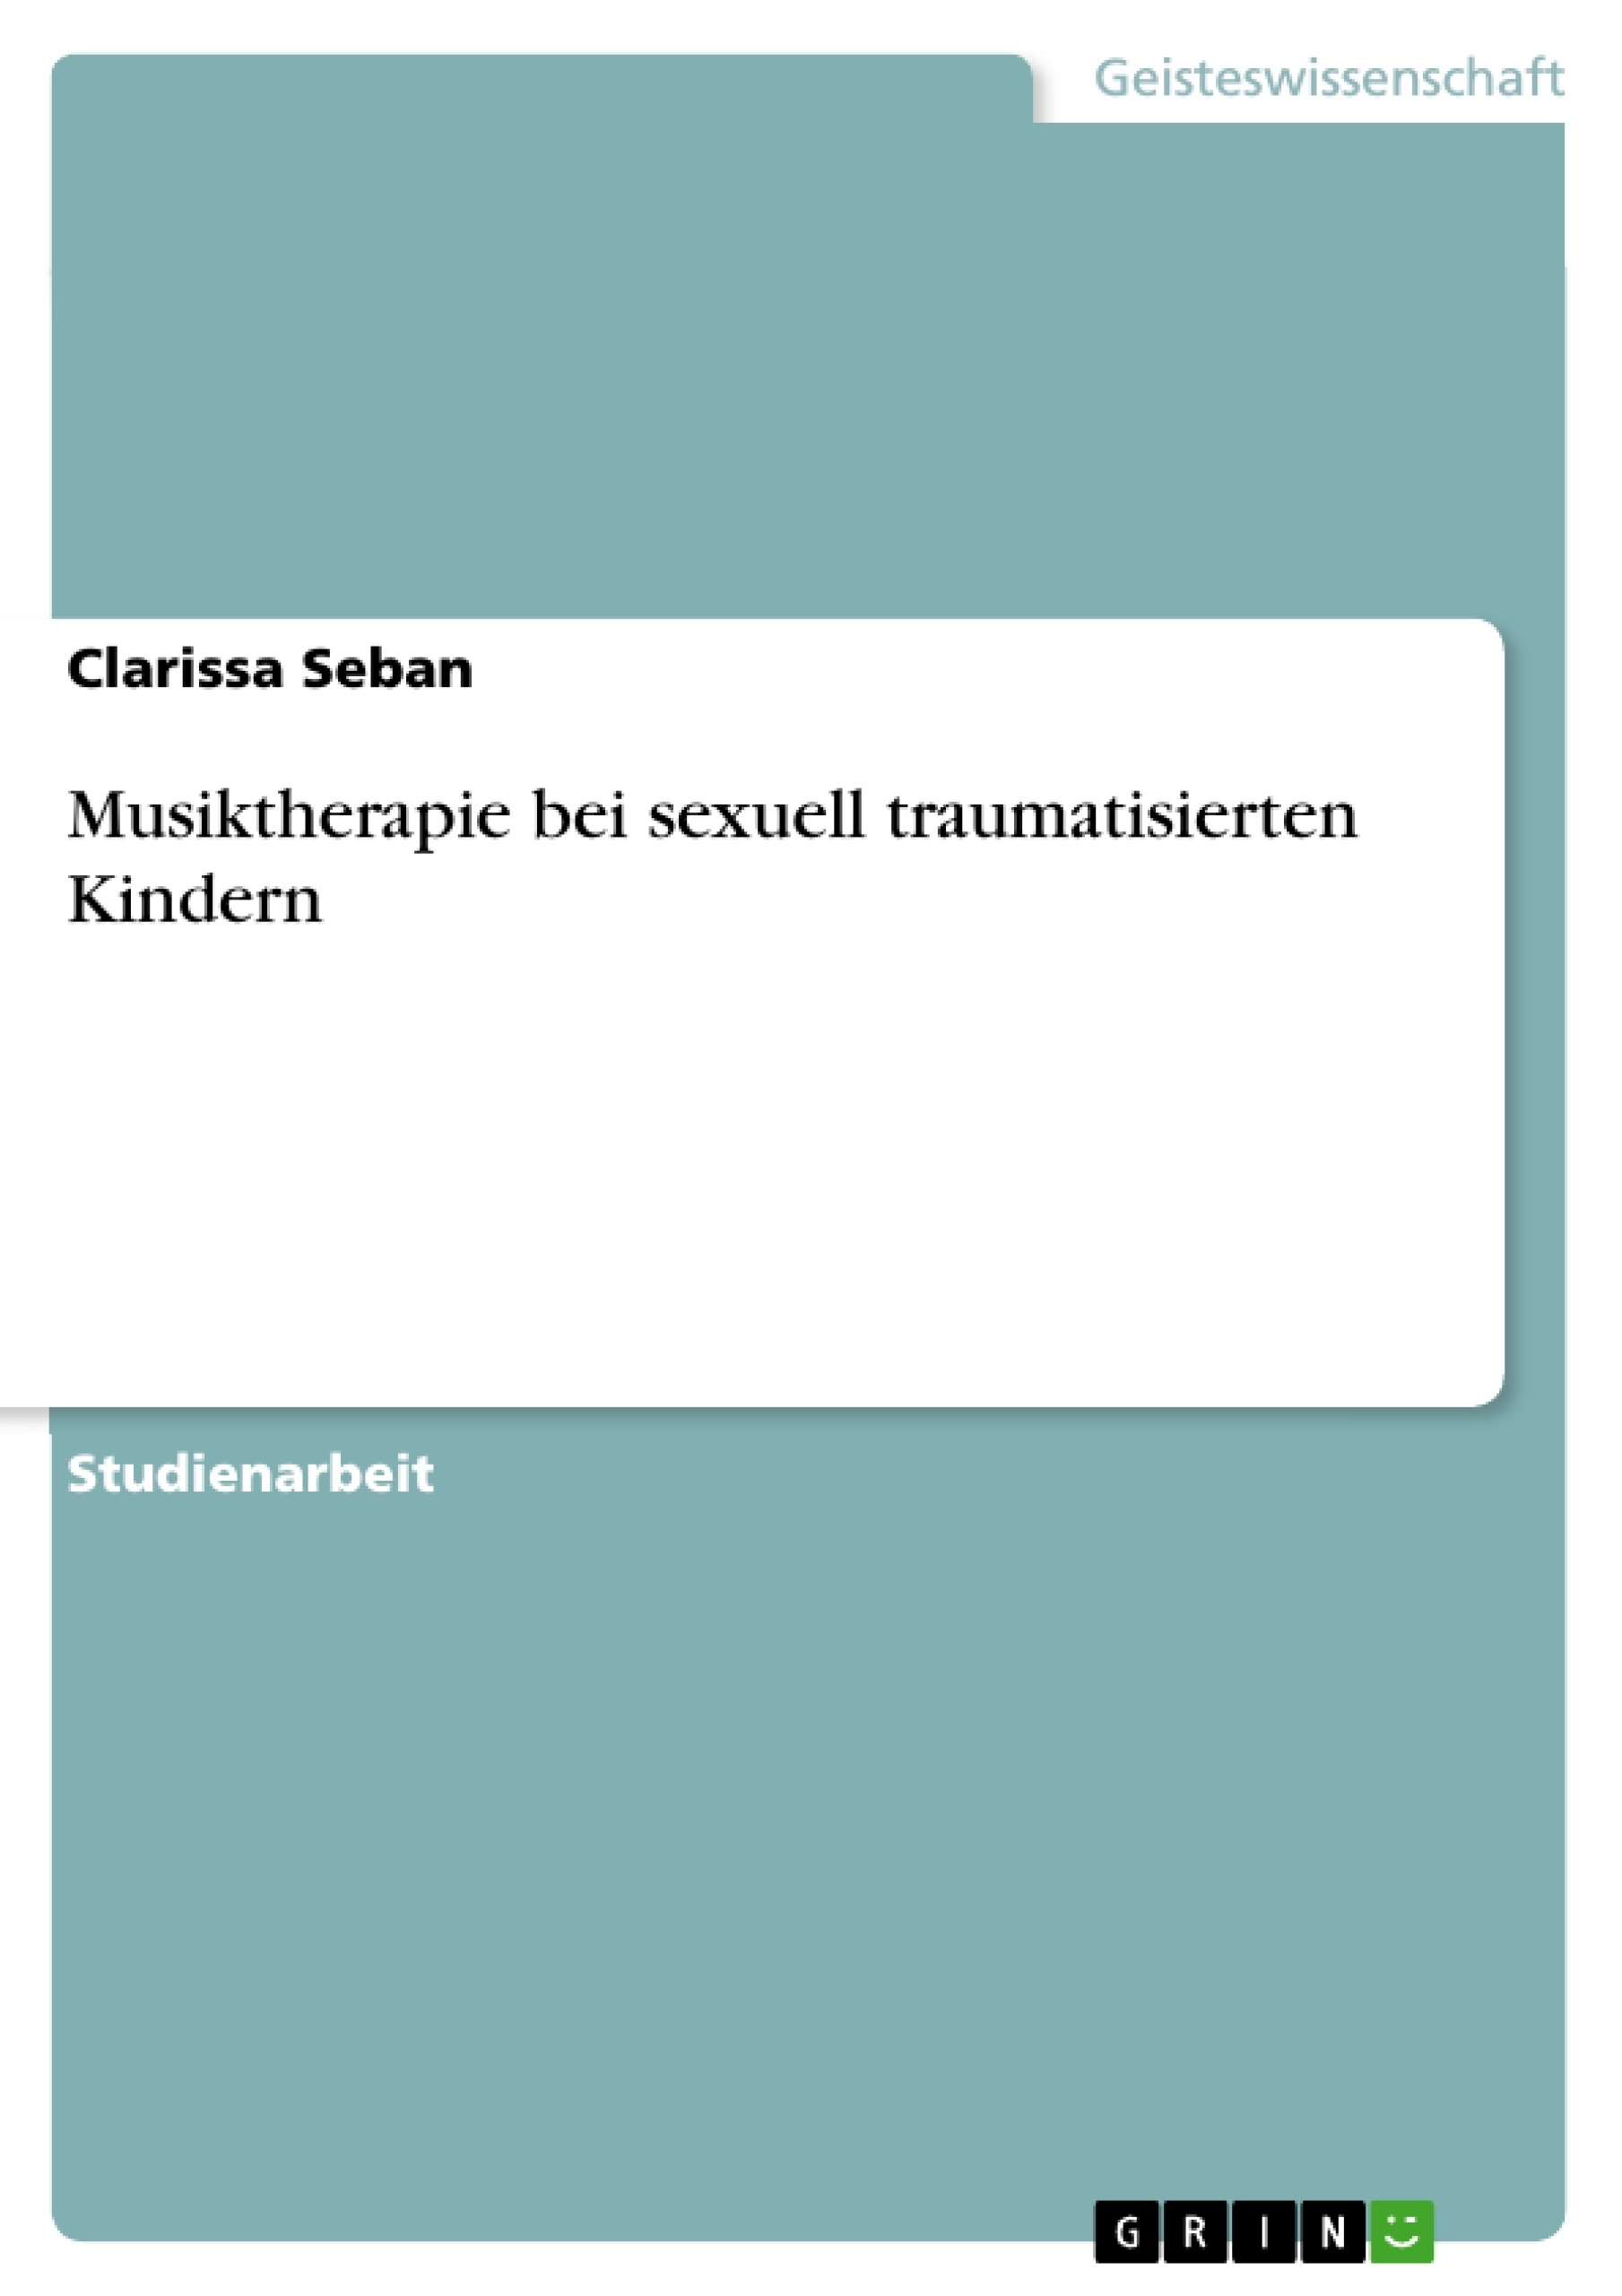 Titel: Musiktherapie bei sexuell traumatisierten Kindern